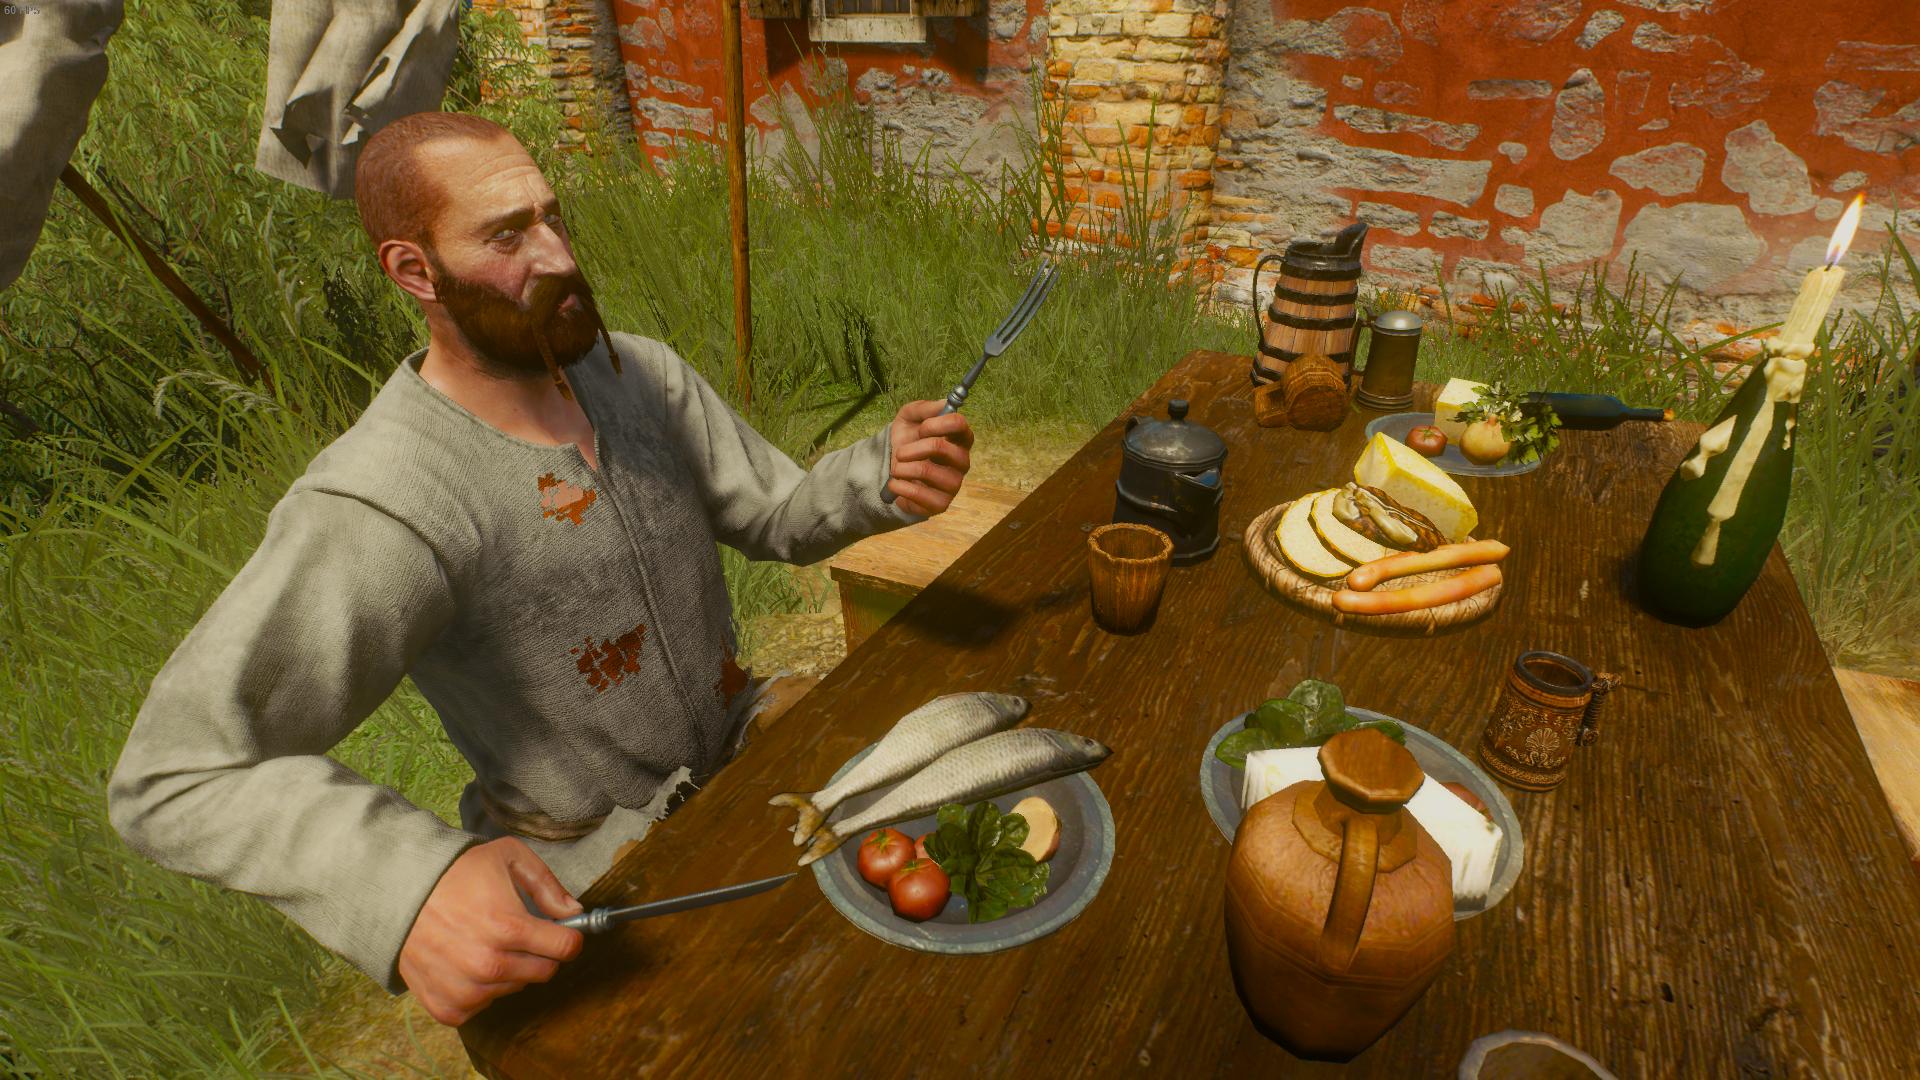 food - Witcher 3: Wild Hunt, the